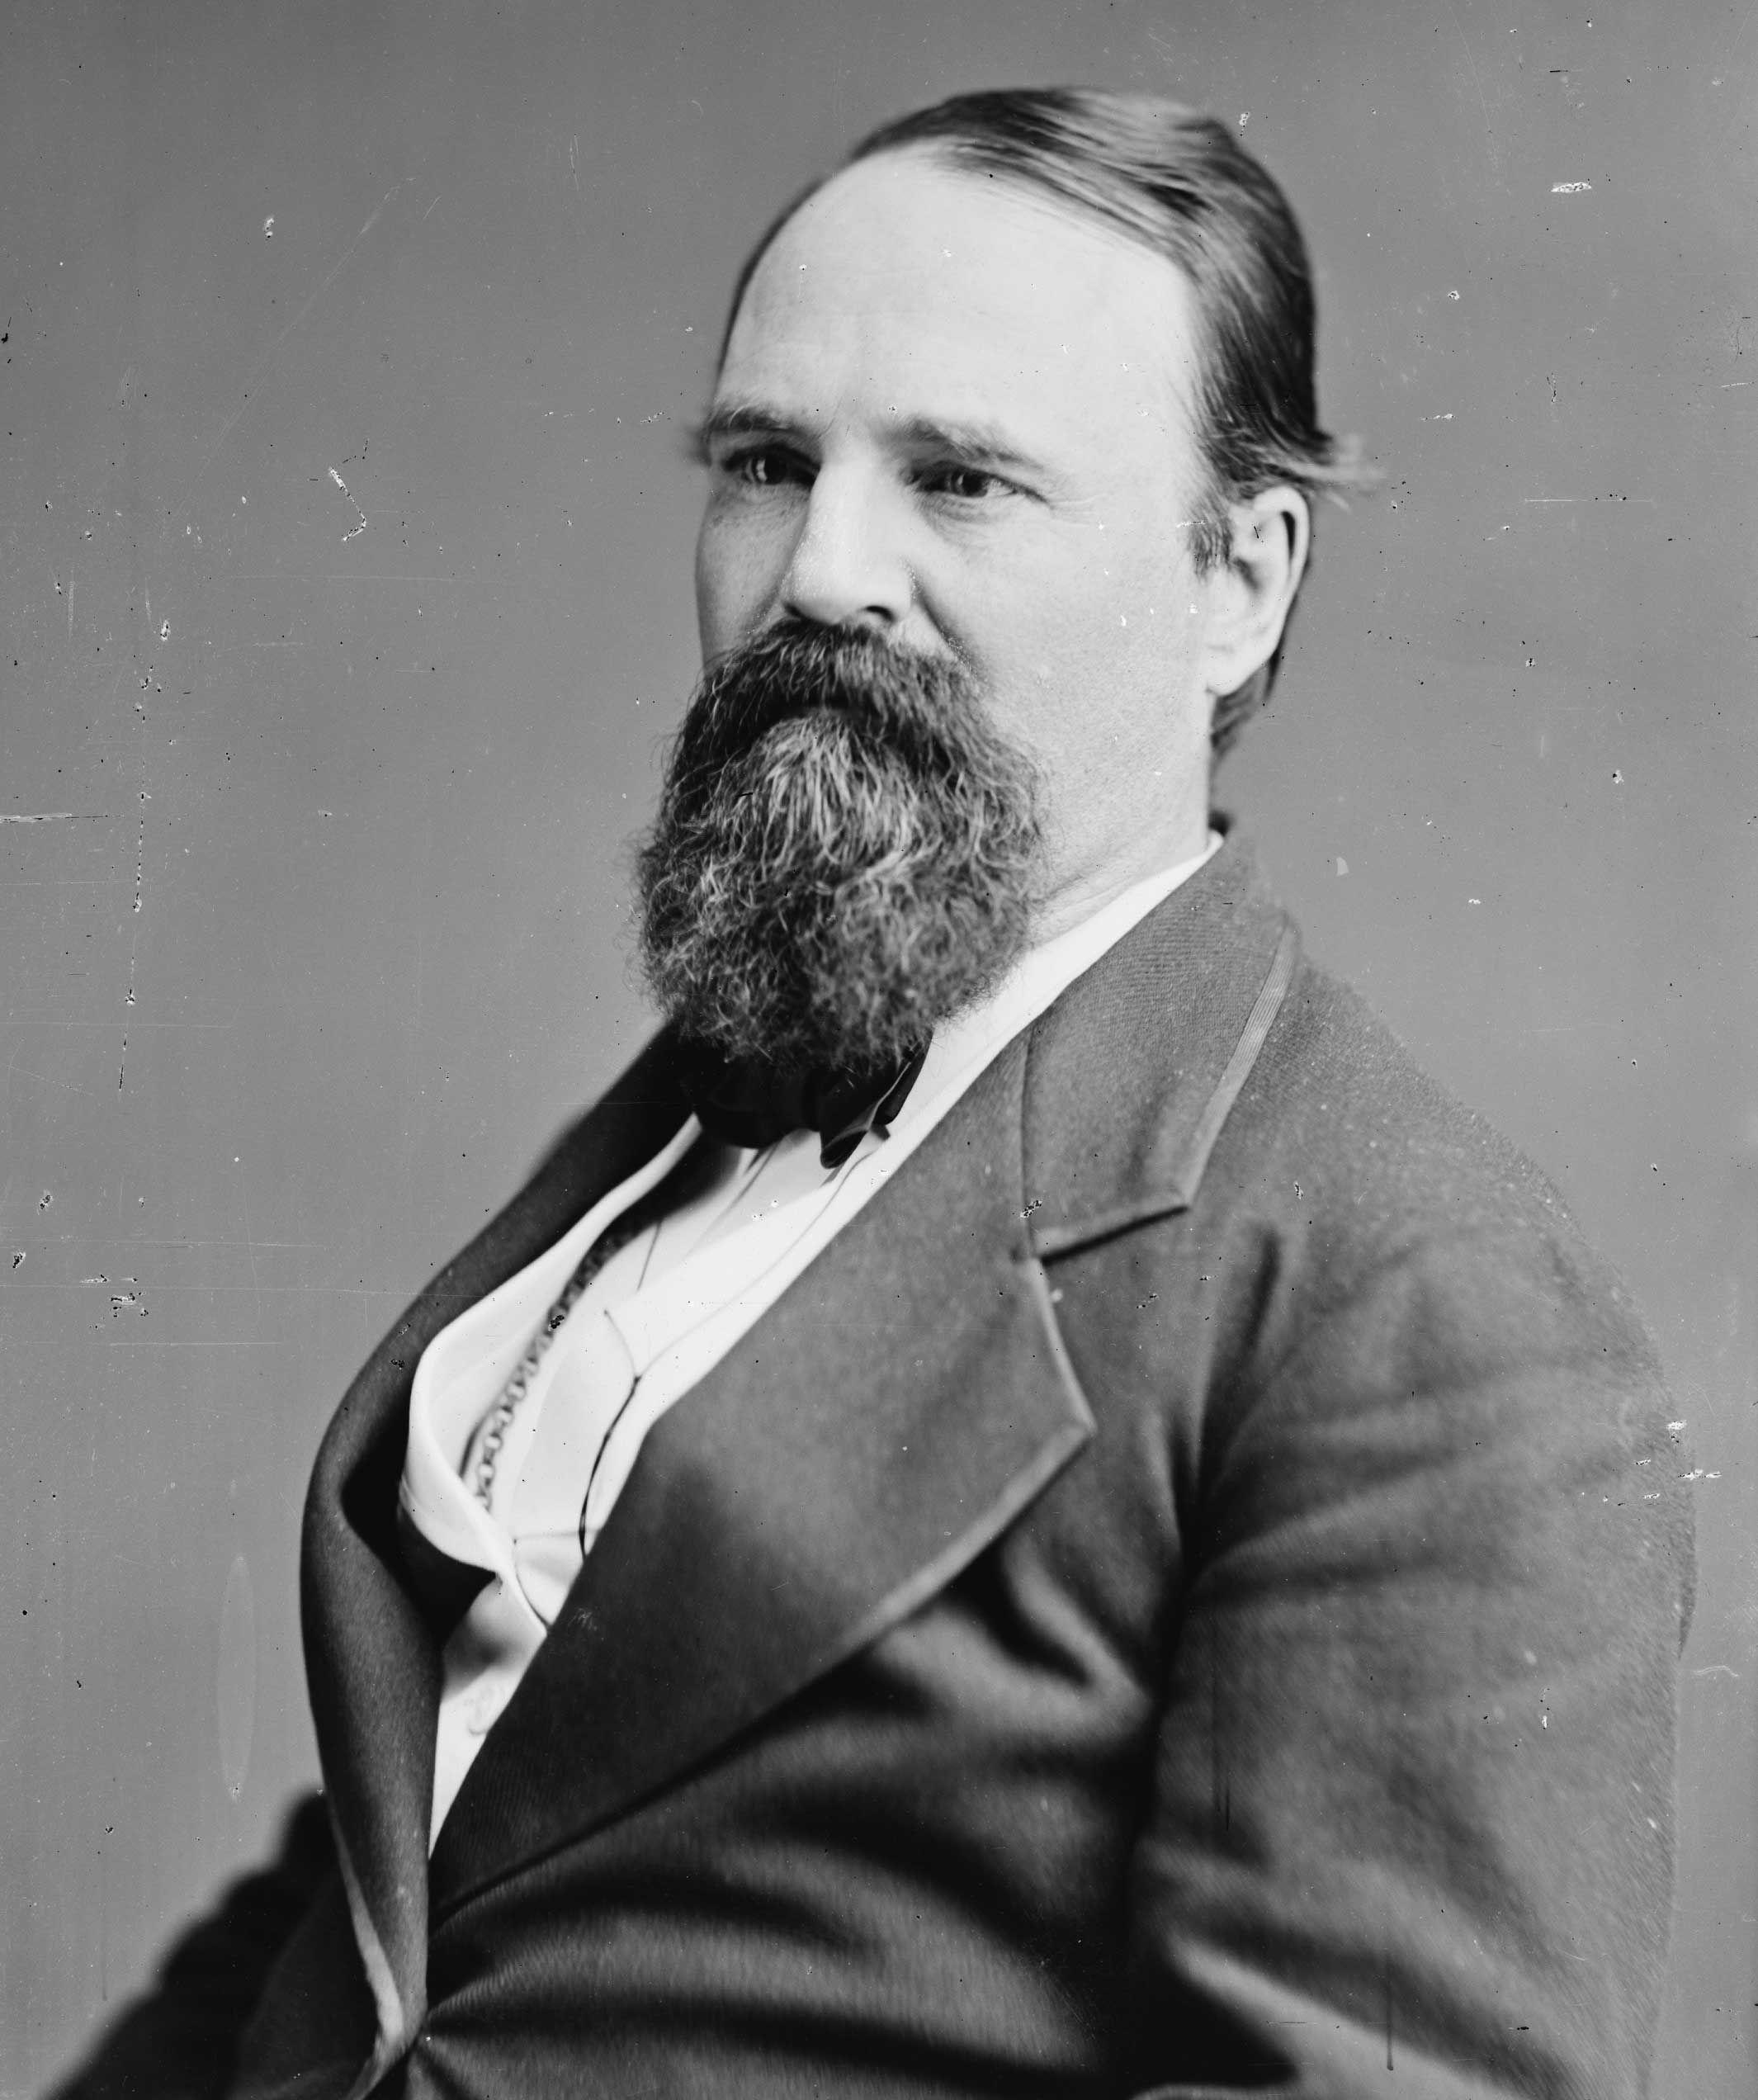 Charles W. Foster - 2nd Secretary Of Treasury (1891-1893)